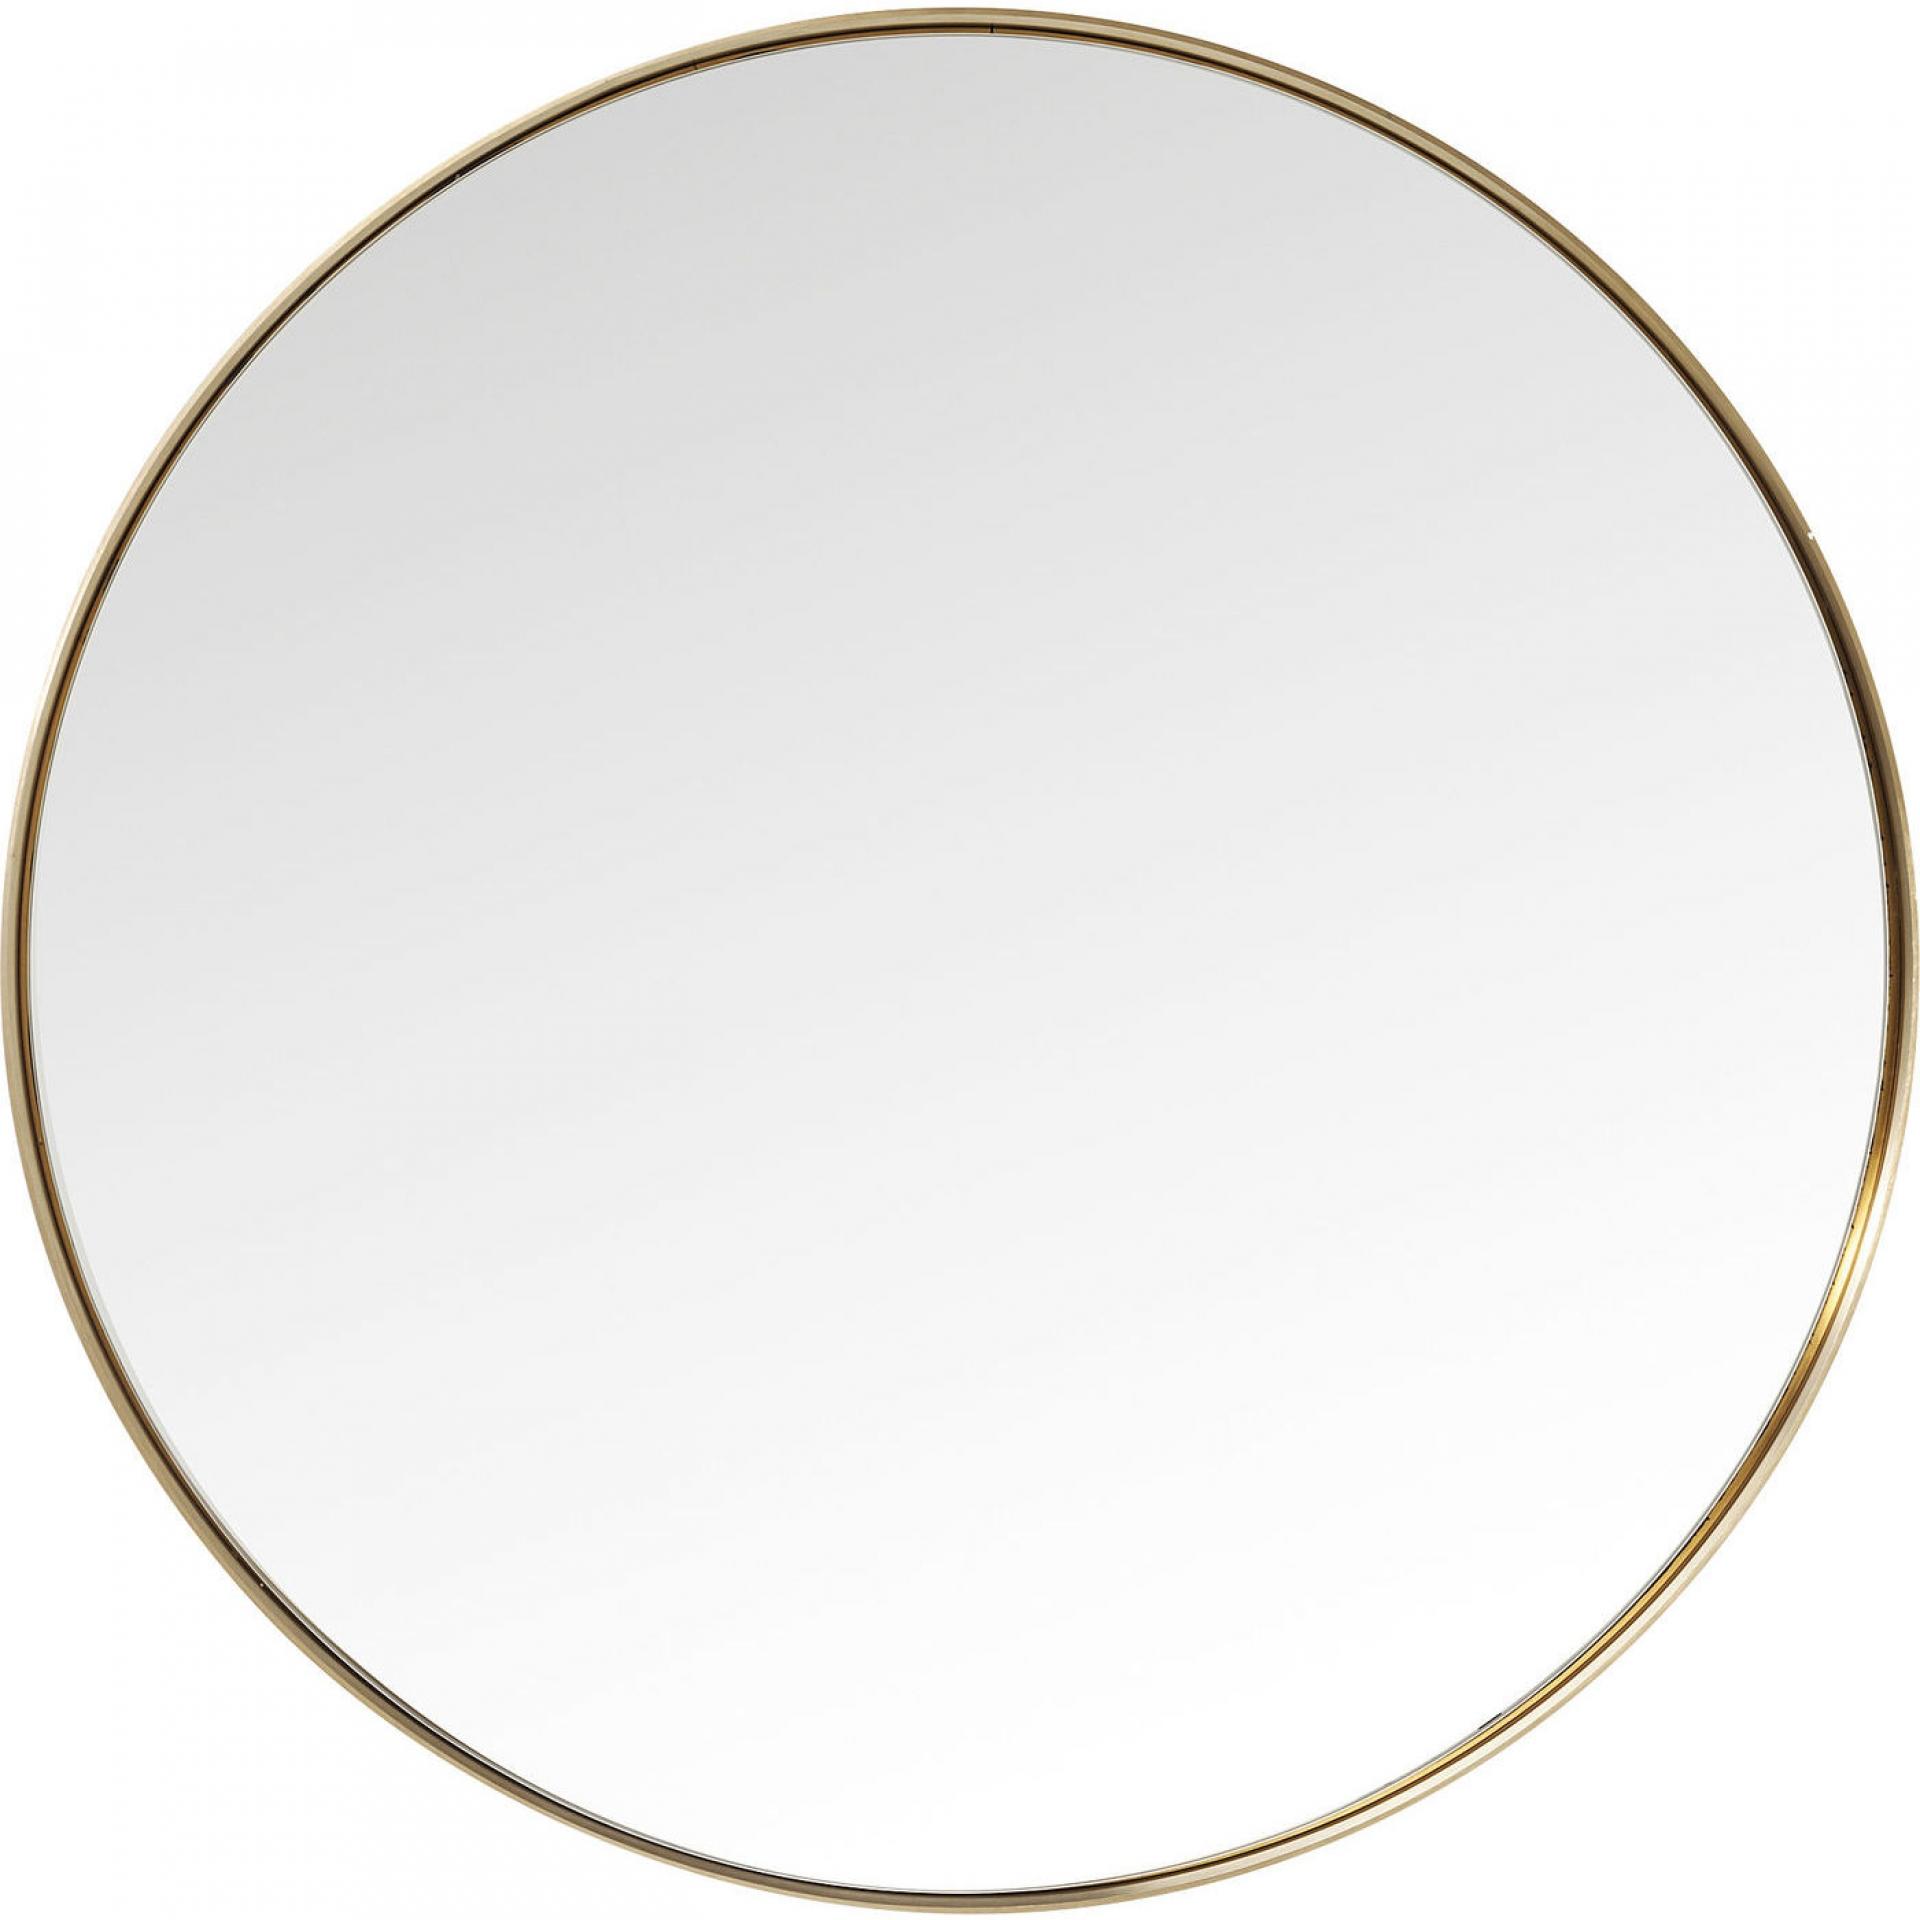 Kadeřnické zrcadlo Kare Curve Round - mosazné (82718) + DÁREK ZDARMA